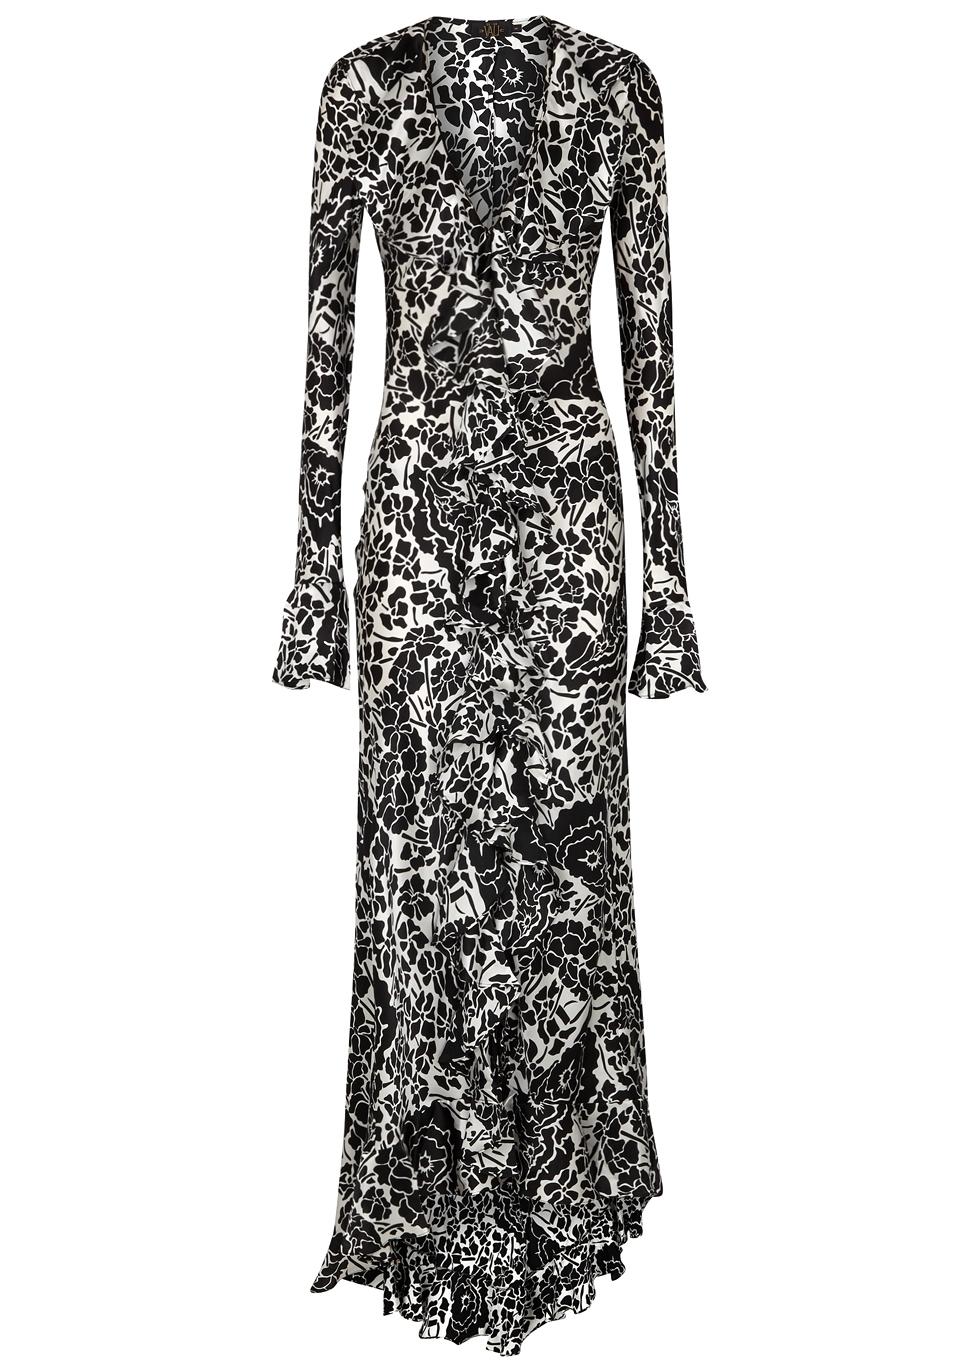 Tangerine Oriental Silk Long Dress, Black And White